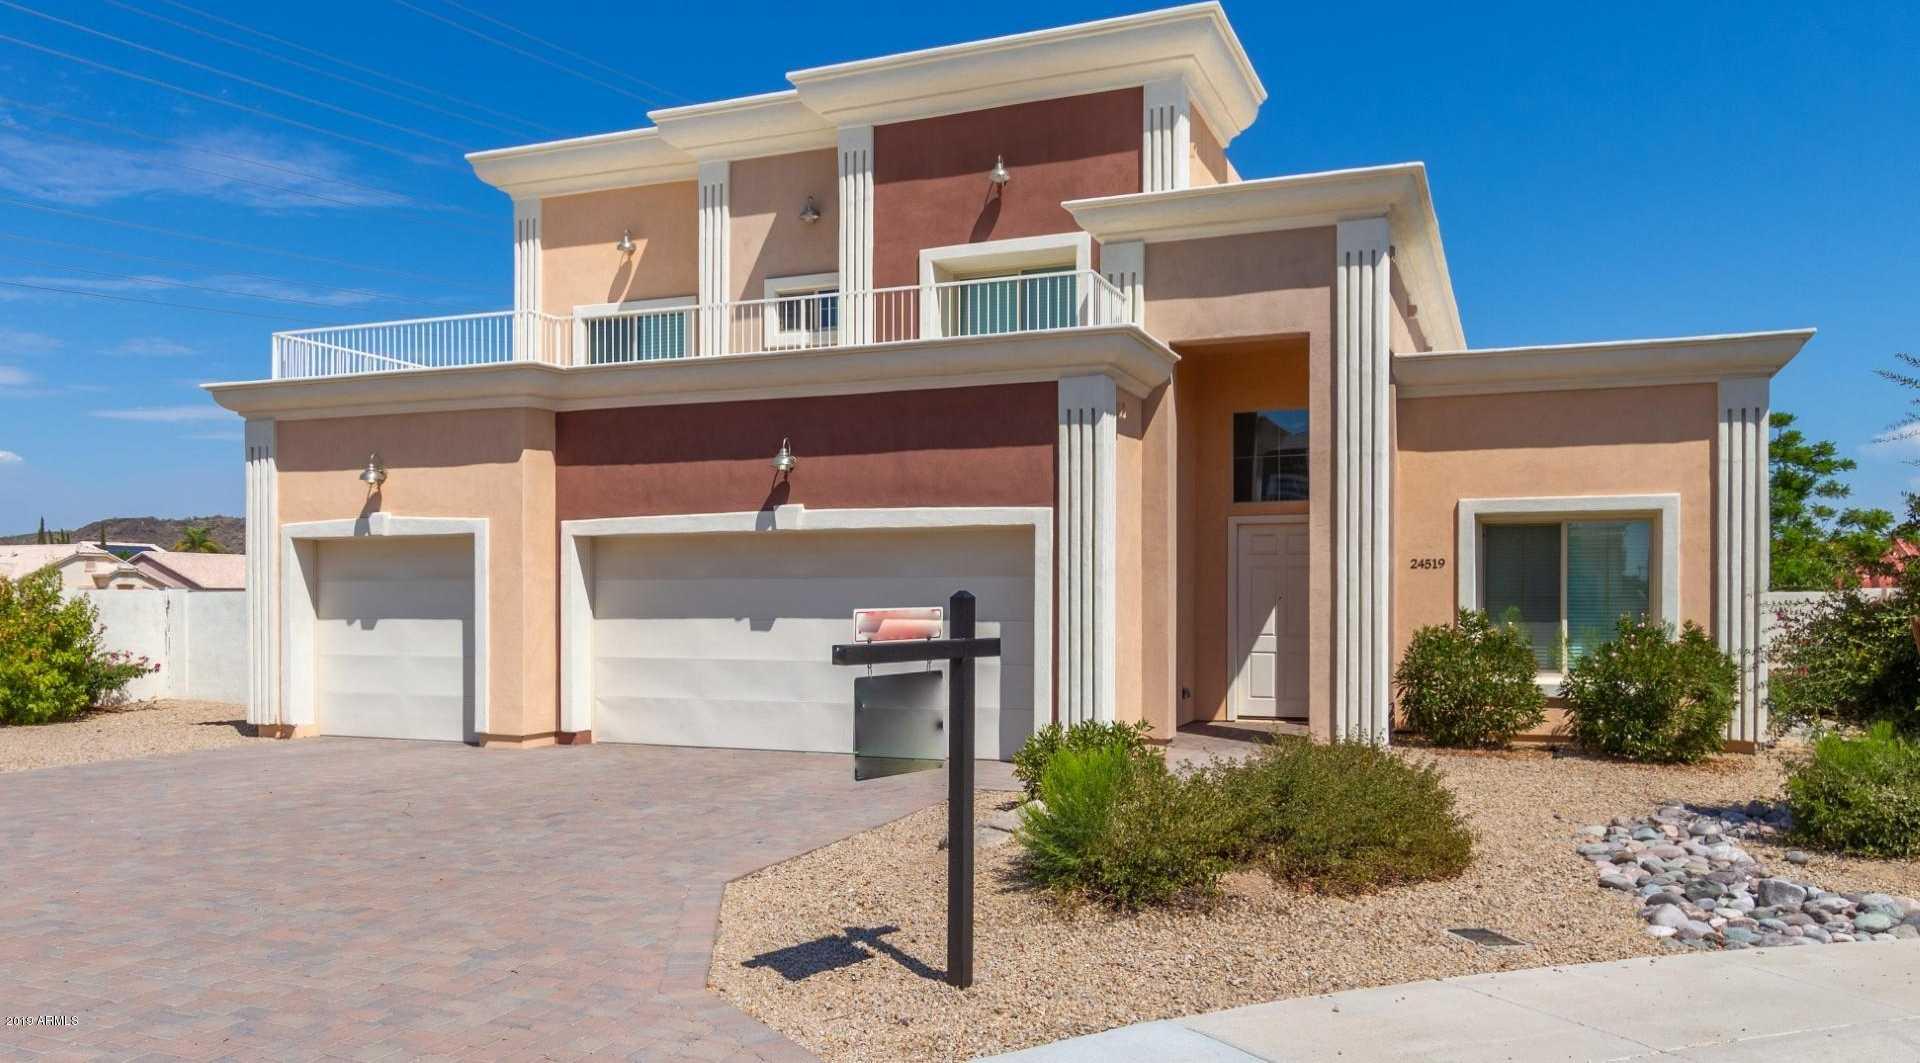 $449,900 - 5Br/3Ba - Home for Sale in Saguaro Park Lofts, Glendale